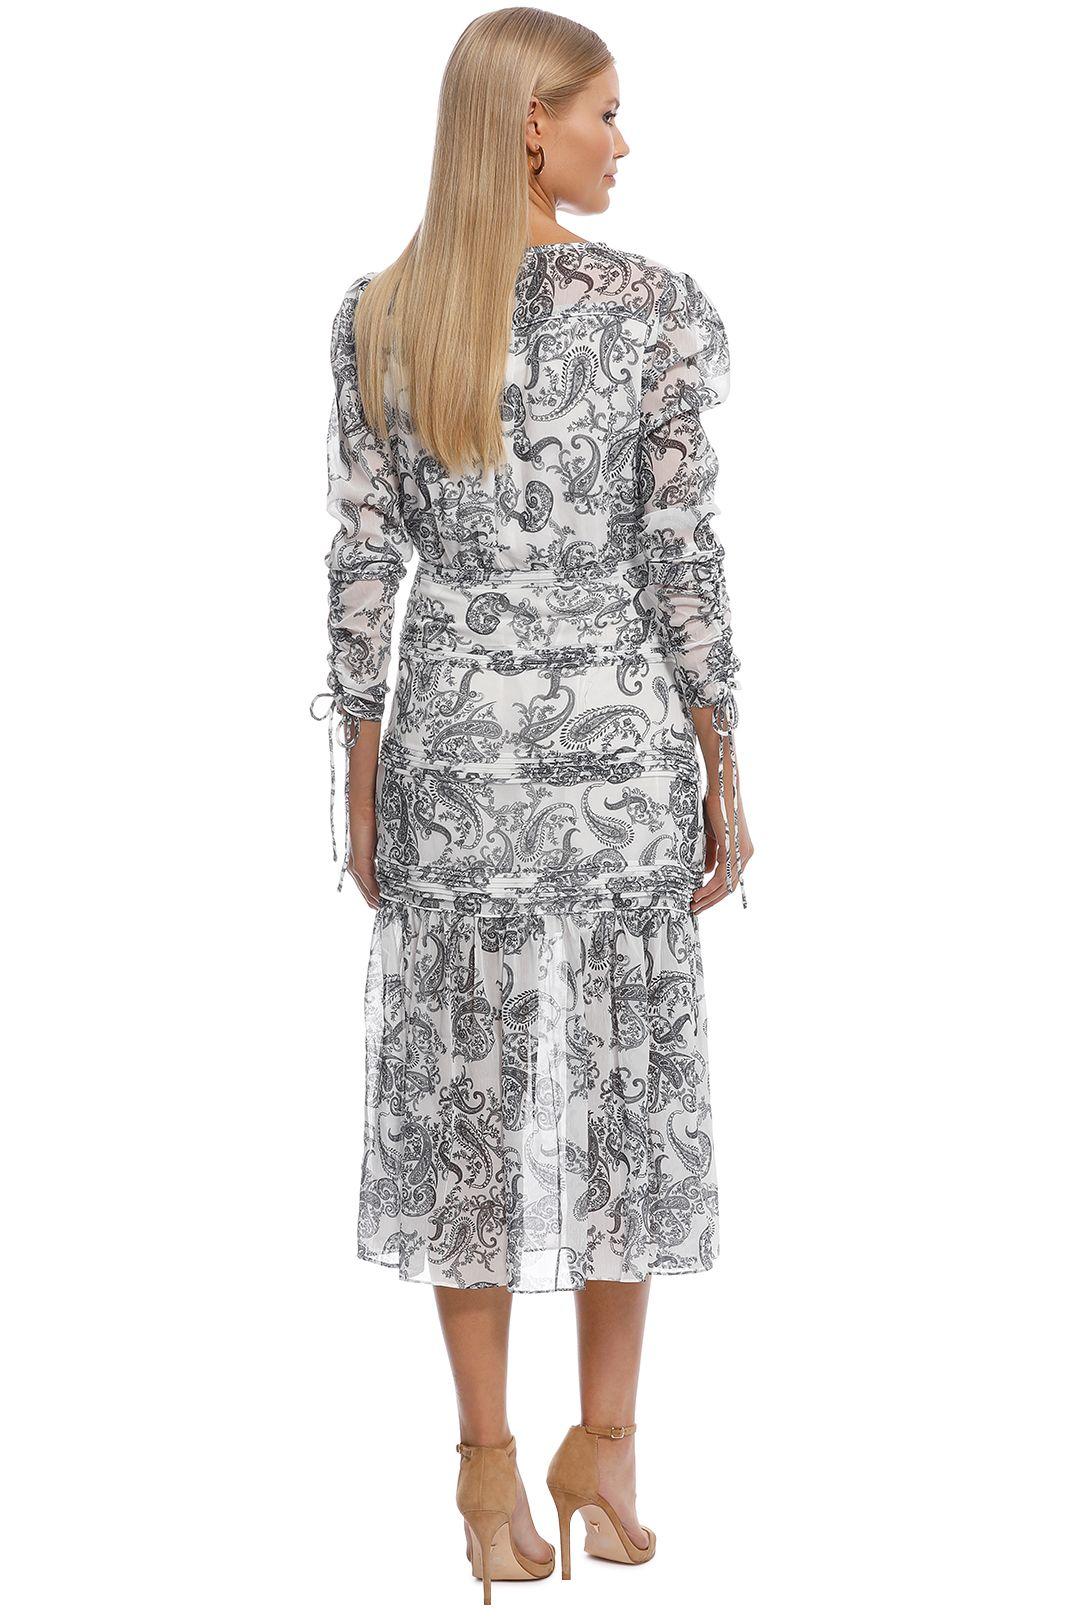 Stevie May - Cinema Midi Dress - Print - Back